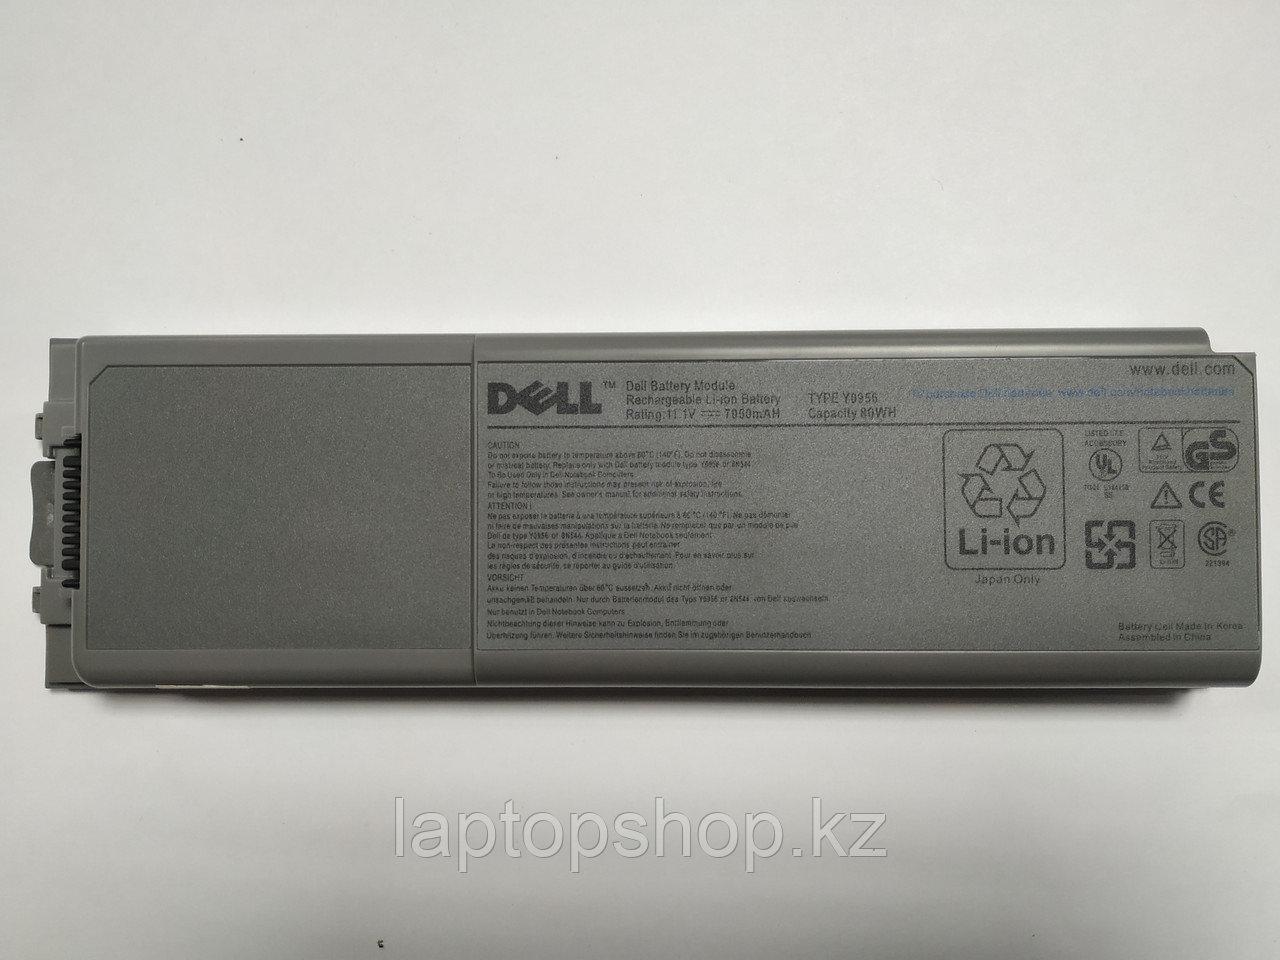 Батарея для ноутбука Original for Dell Y0956